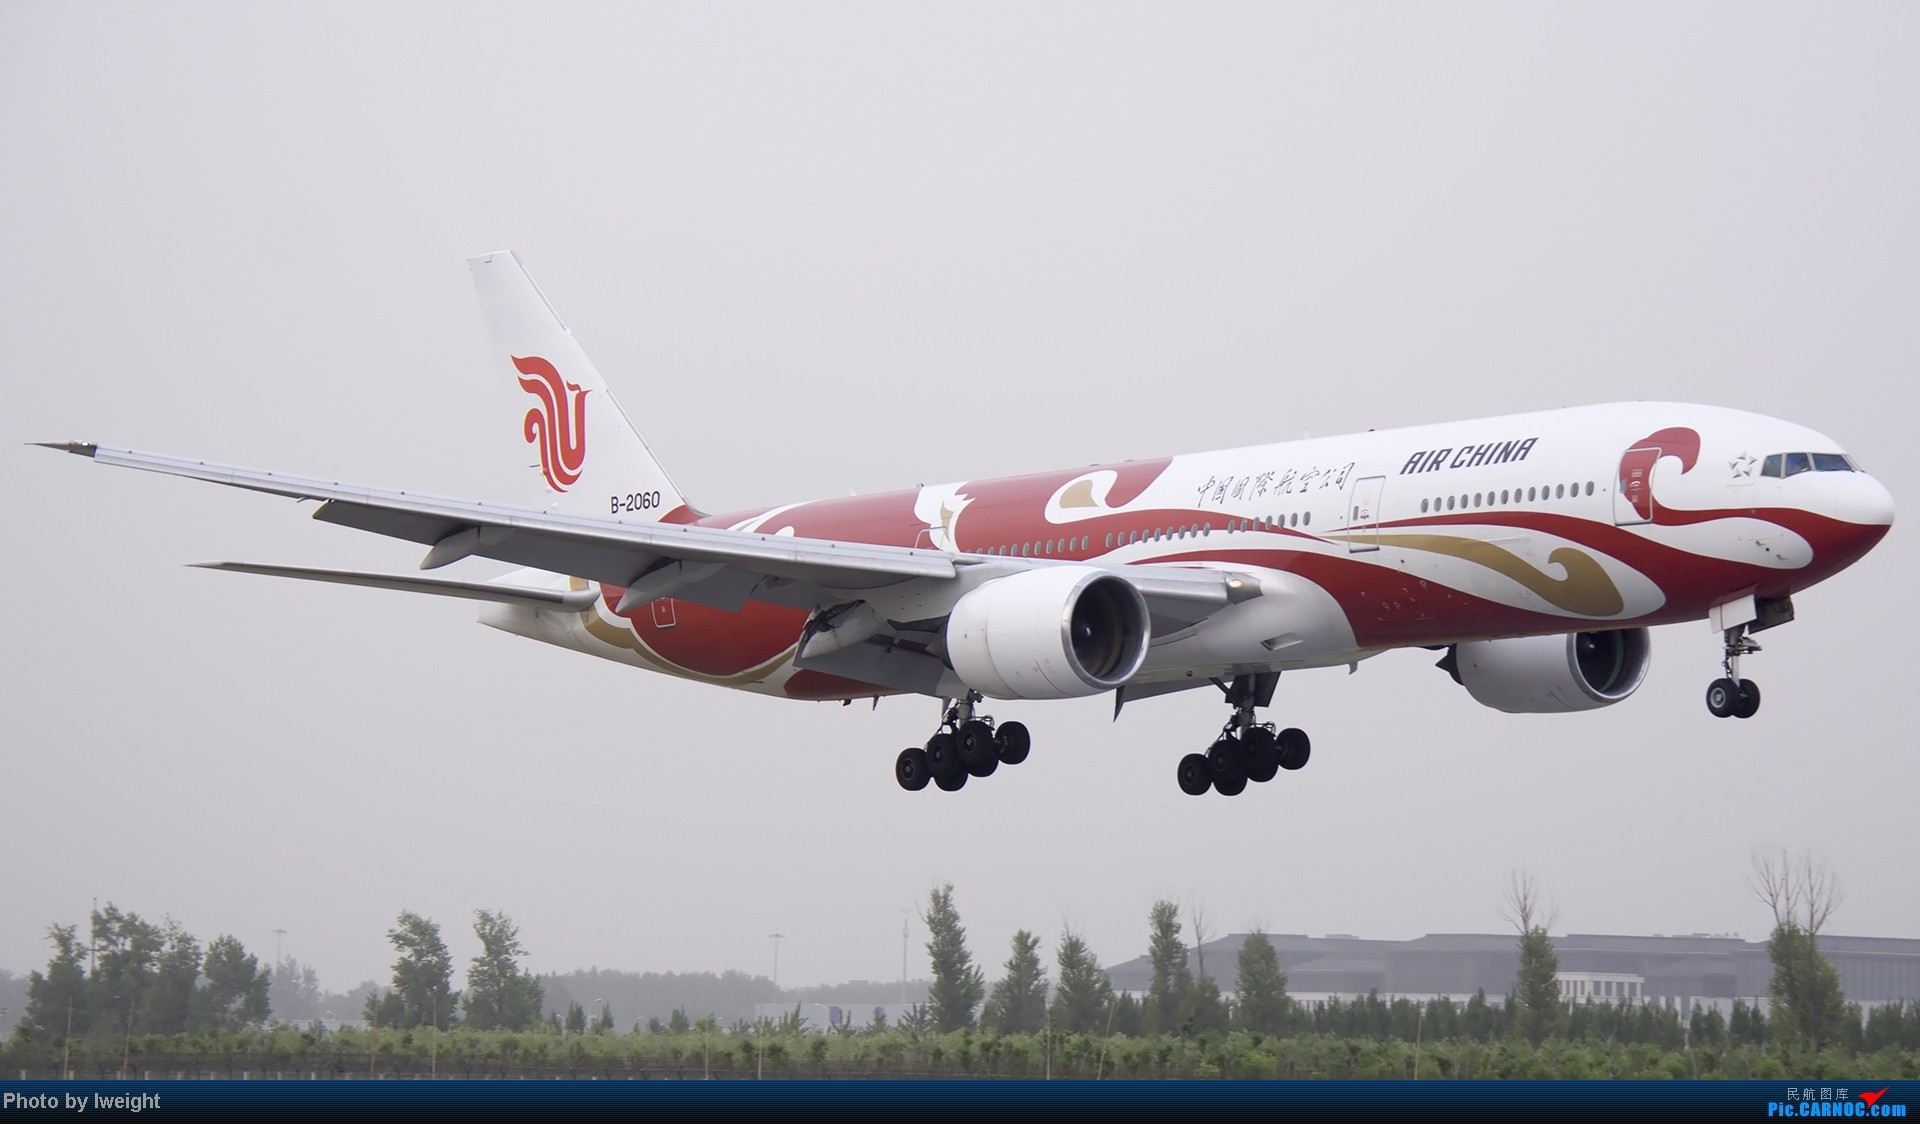 Re:[原创]霾天首都机场随拍 BOEING 777-200 B-2060 中国北京首都机场